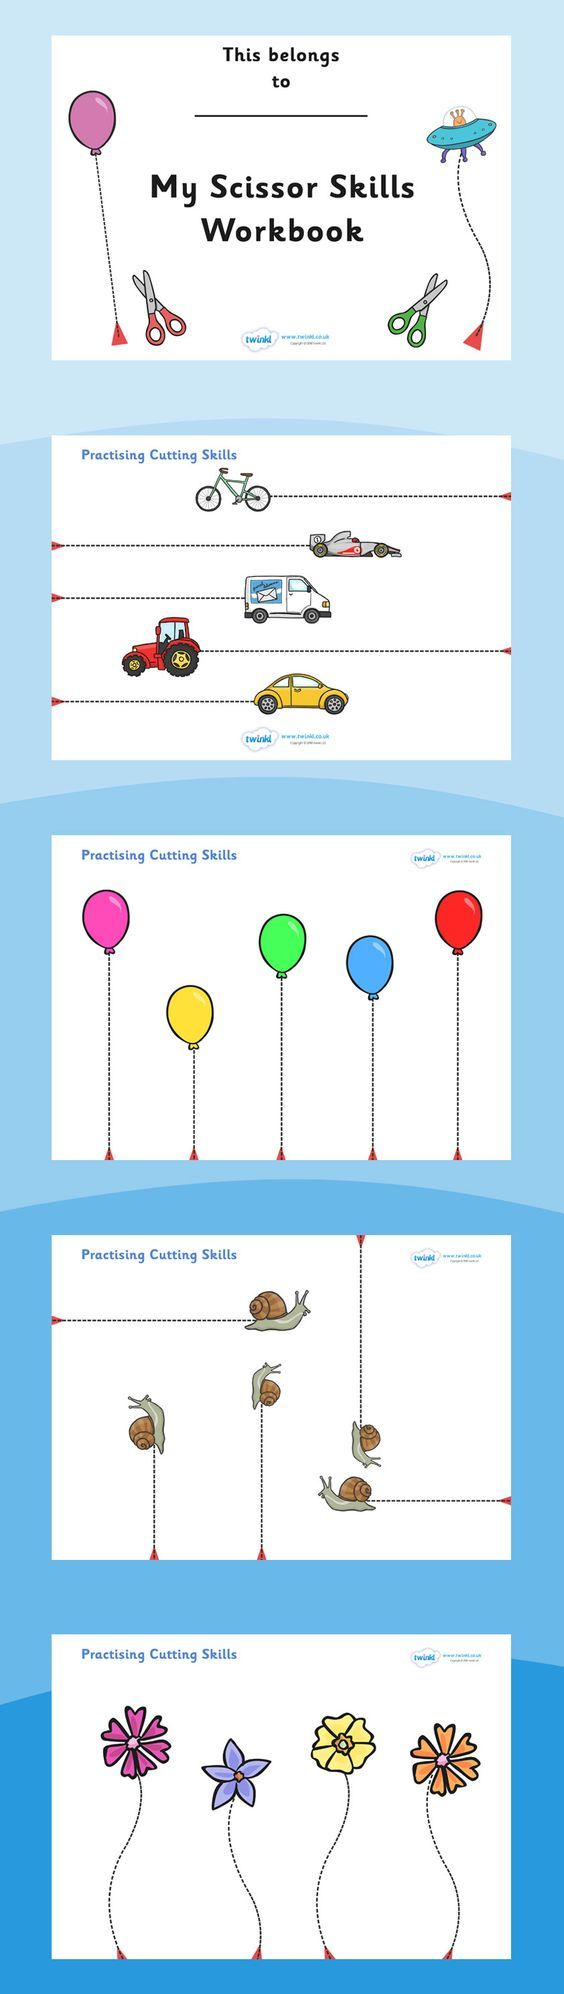 Scissor Cutting Skills Workbook